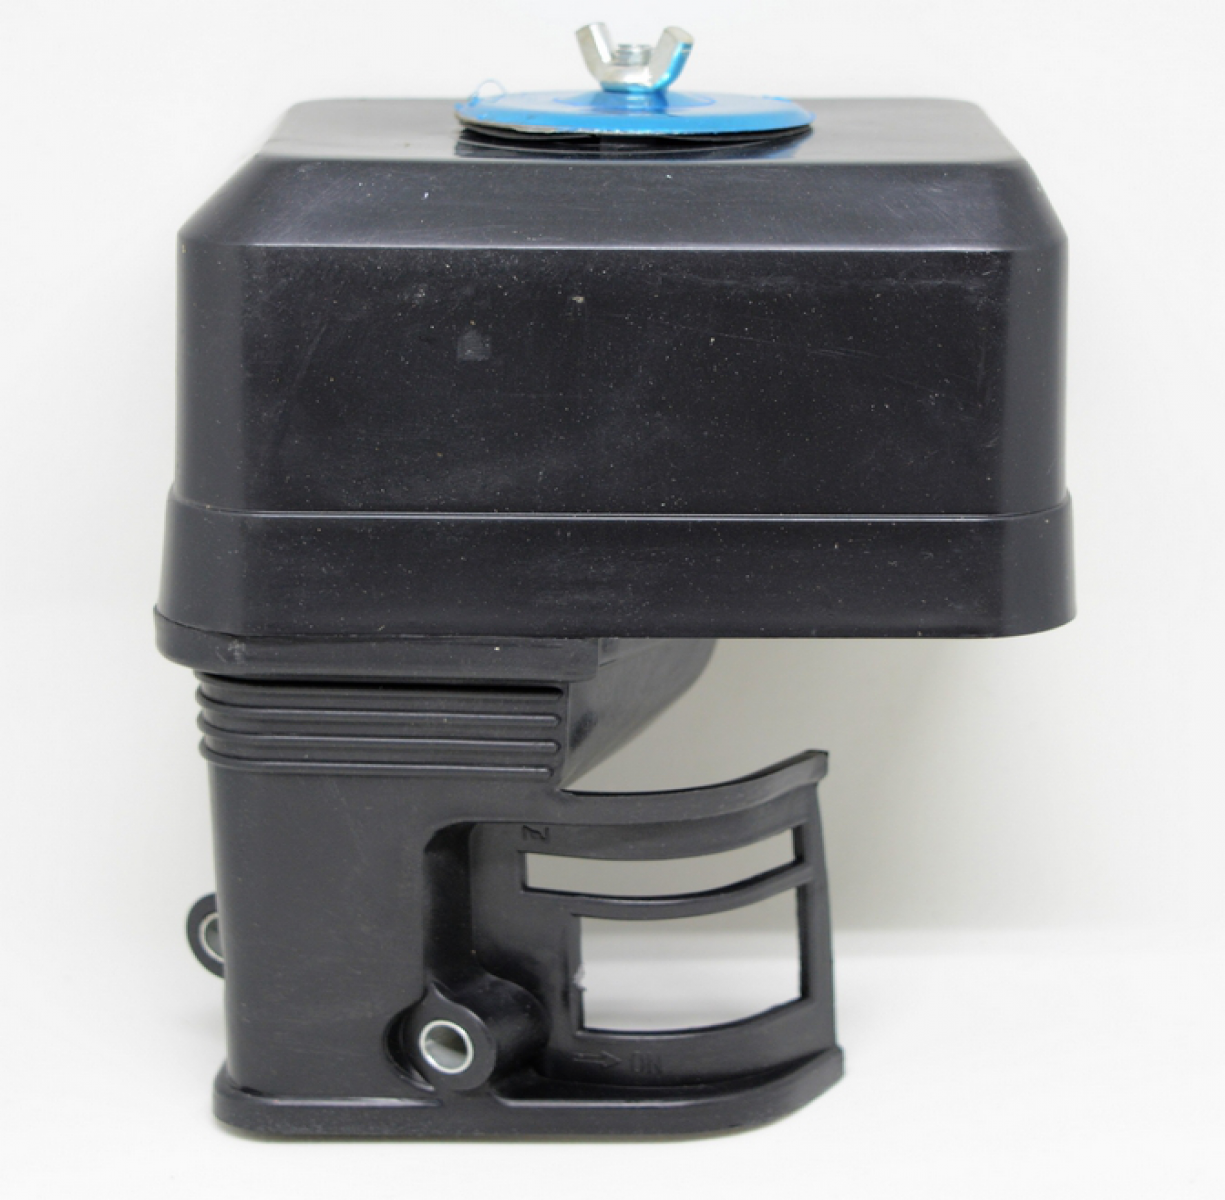 Kryt vzduchového filtru Honda GX160 GX140